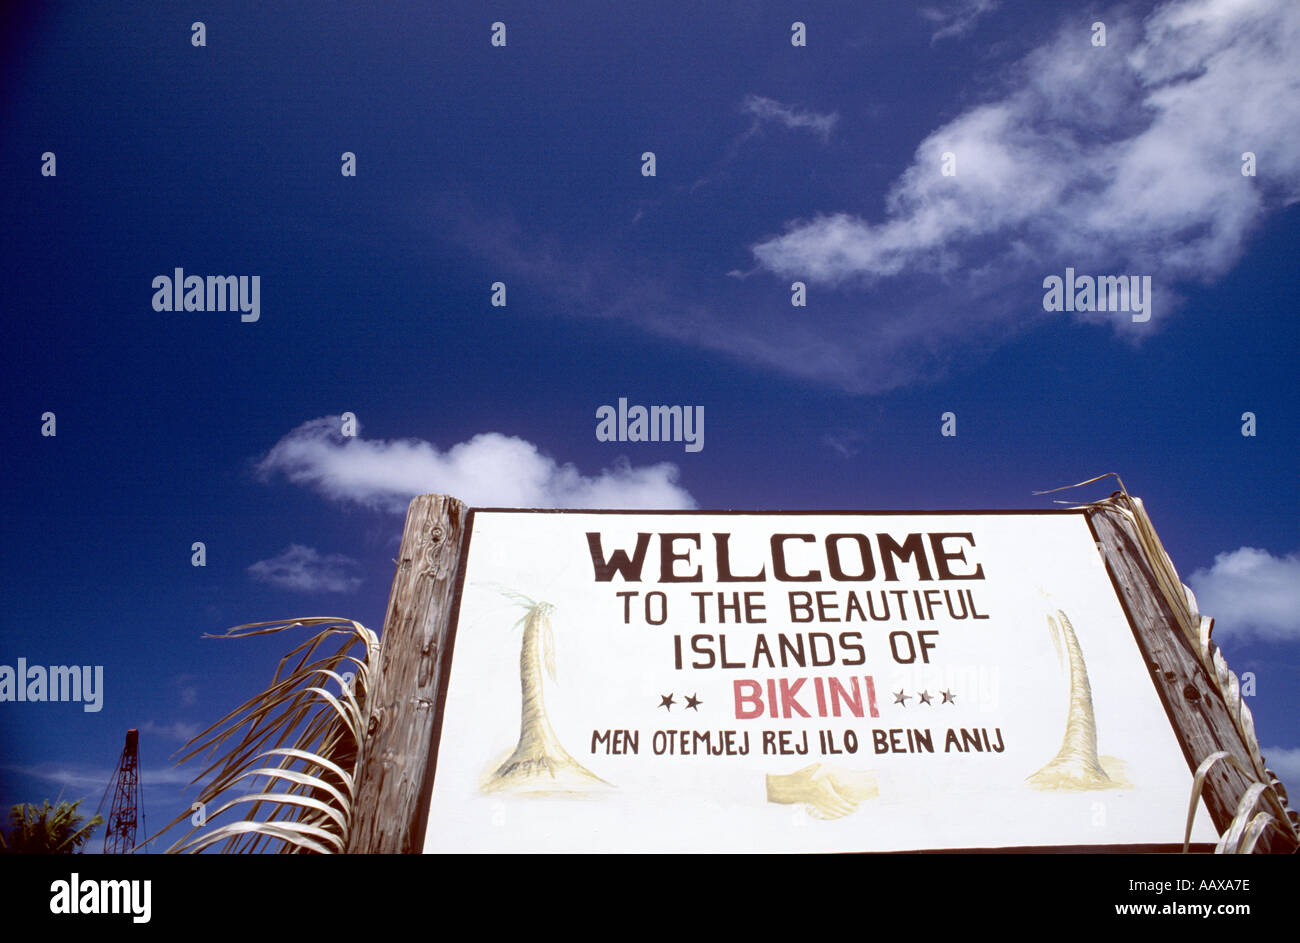 Bikini atoll history ass